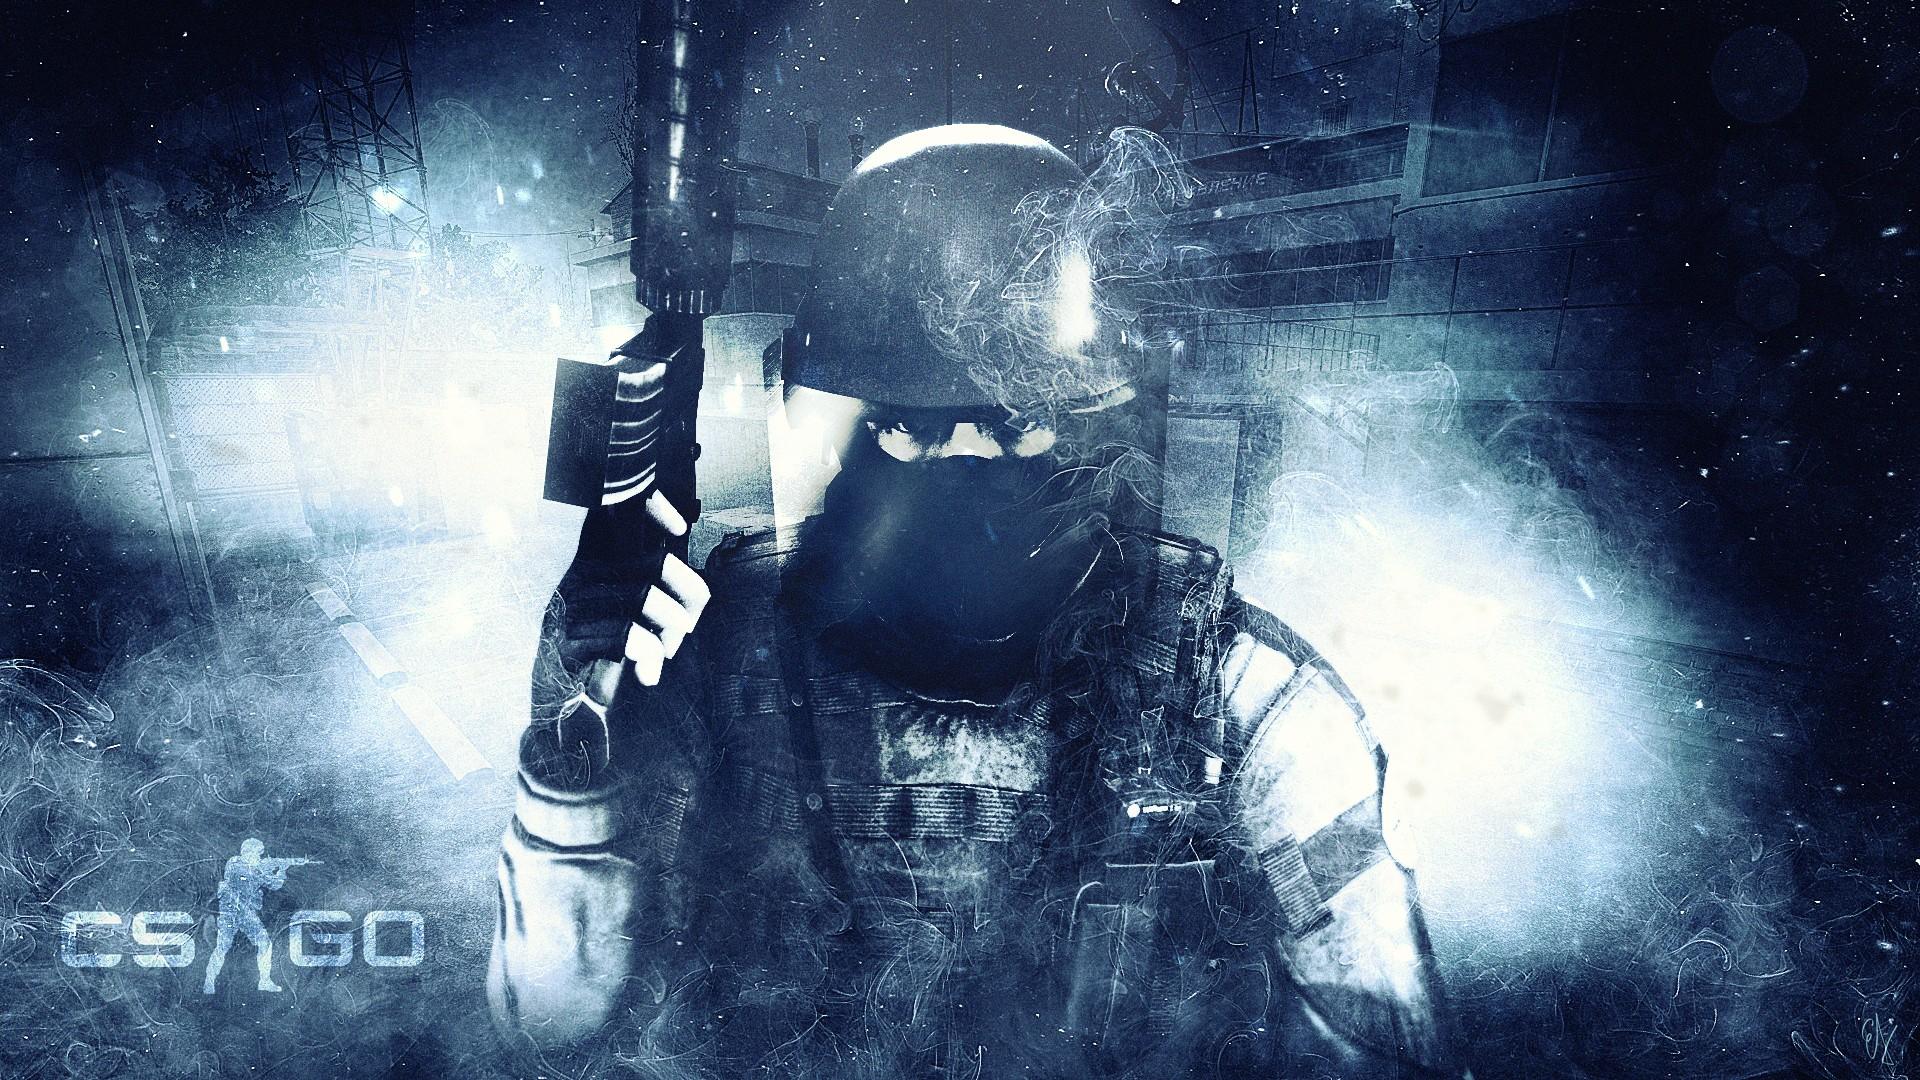 Counter Strike Source Ipad: Counter Strike Wallpaper ·① Download Free Beautiful Full